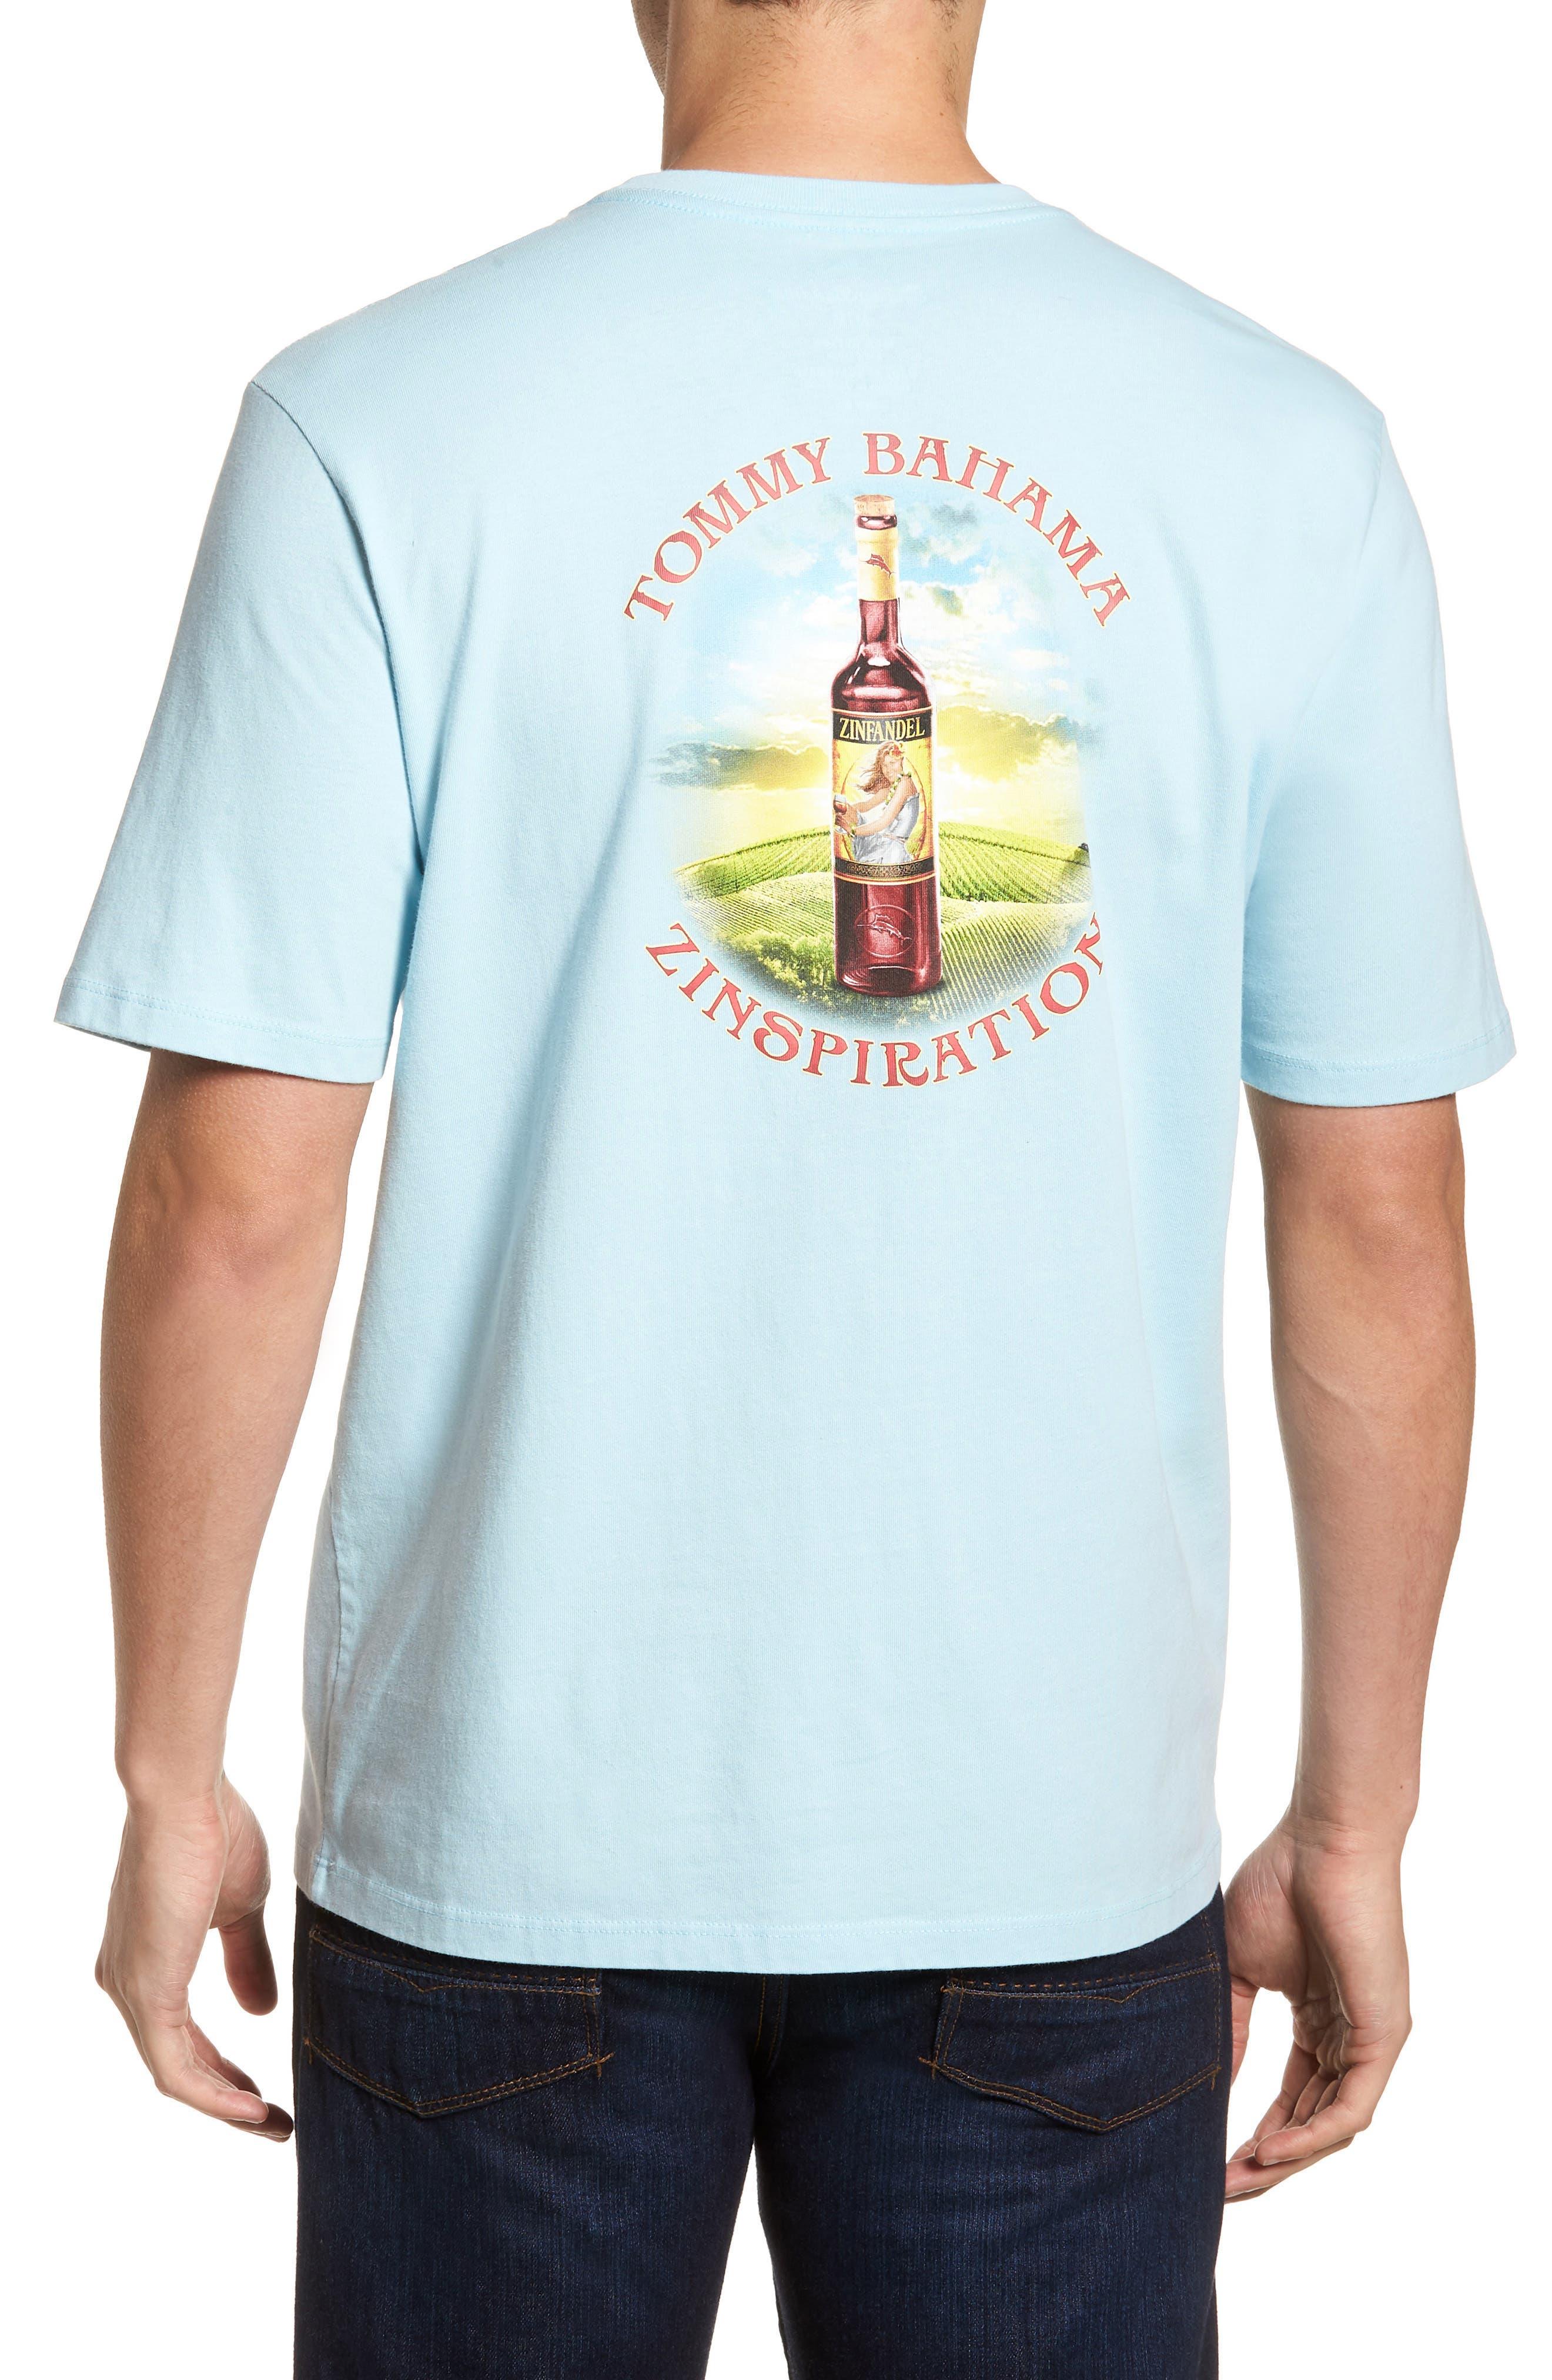 Zinspiration T-Shirt,                             Alternate thumbnail 2, color,                             Opal